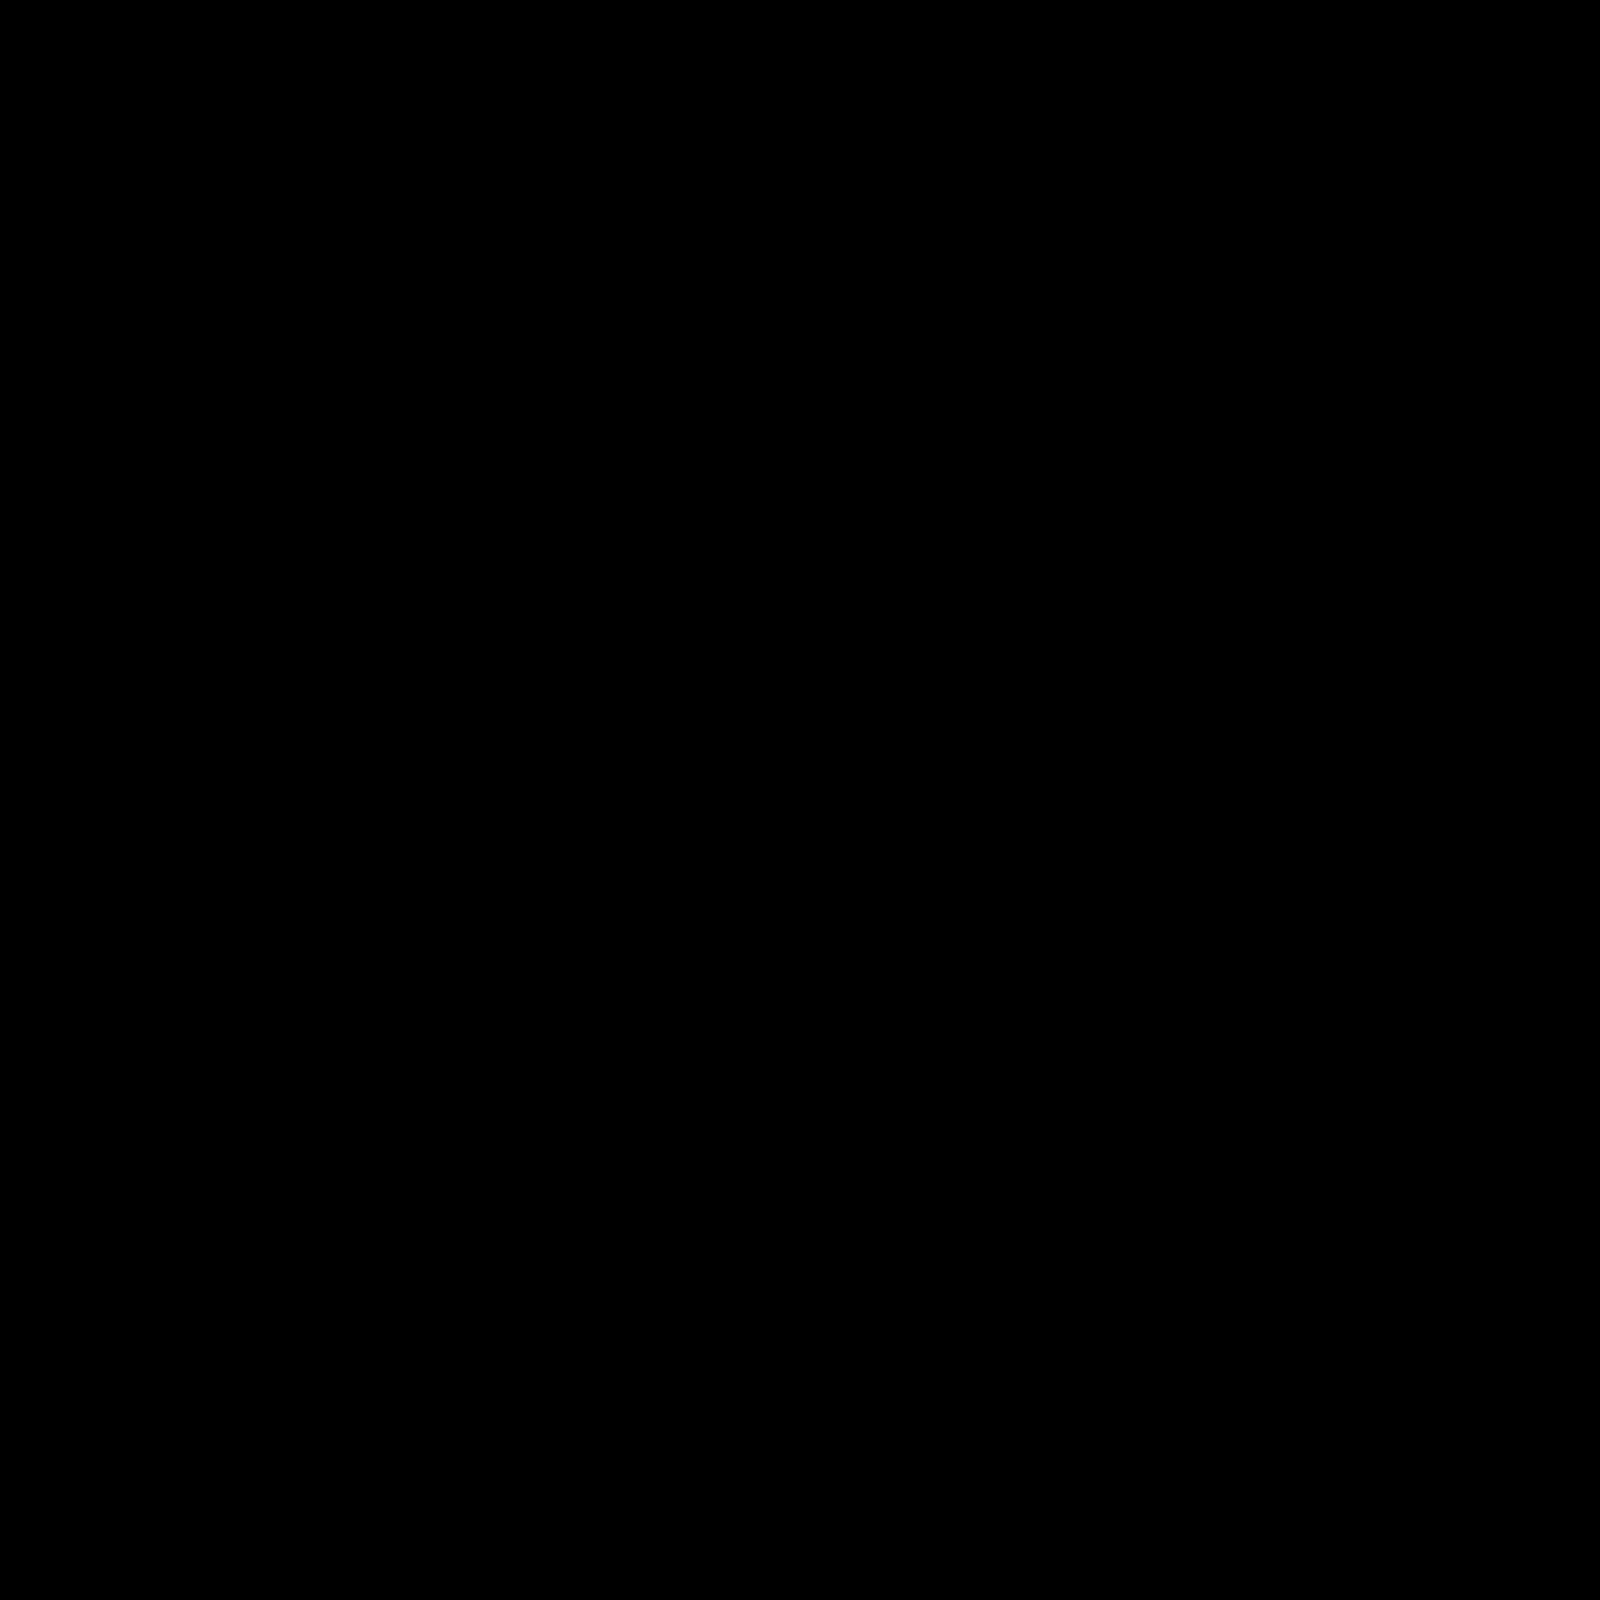 Pronation of Foot icon